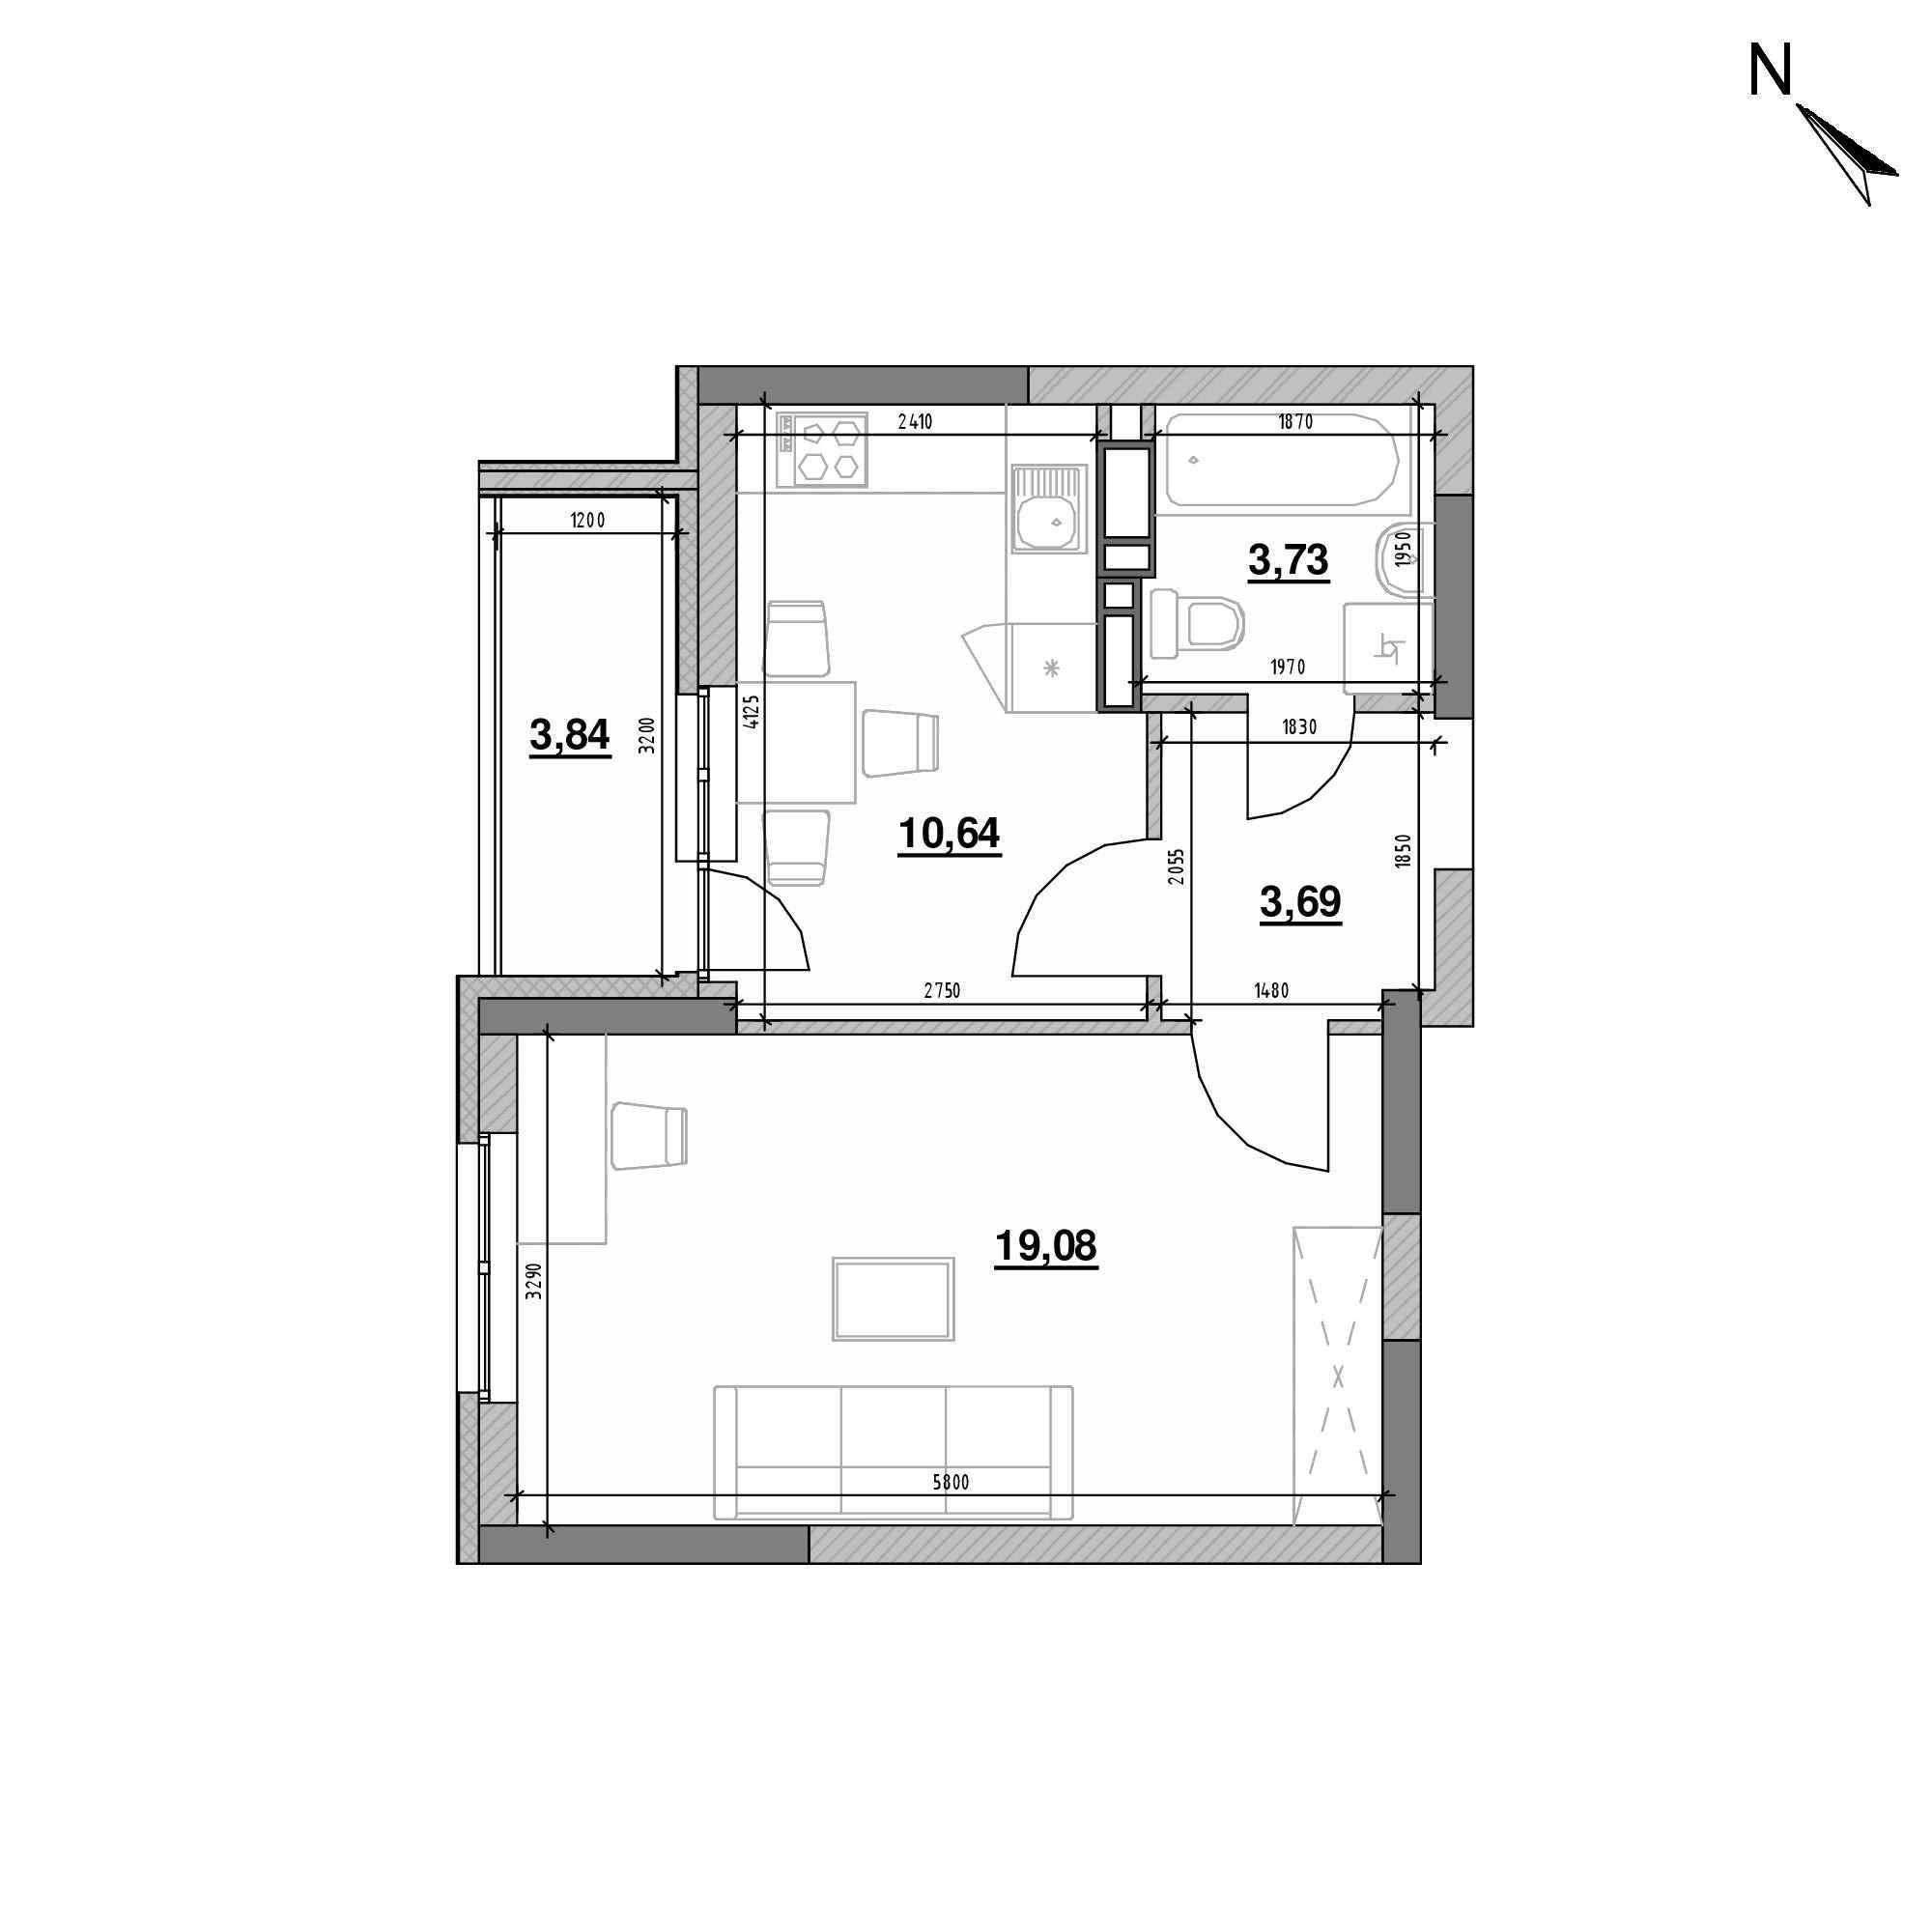 ЖК Оk'Land: планування 1-кімнатної квартири, №262, 40.98 м<sup>2</sup>